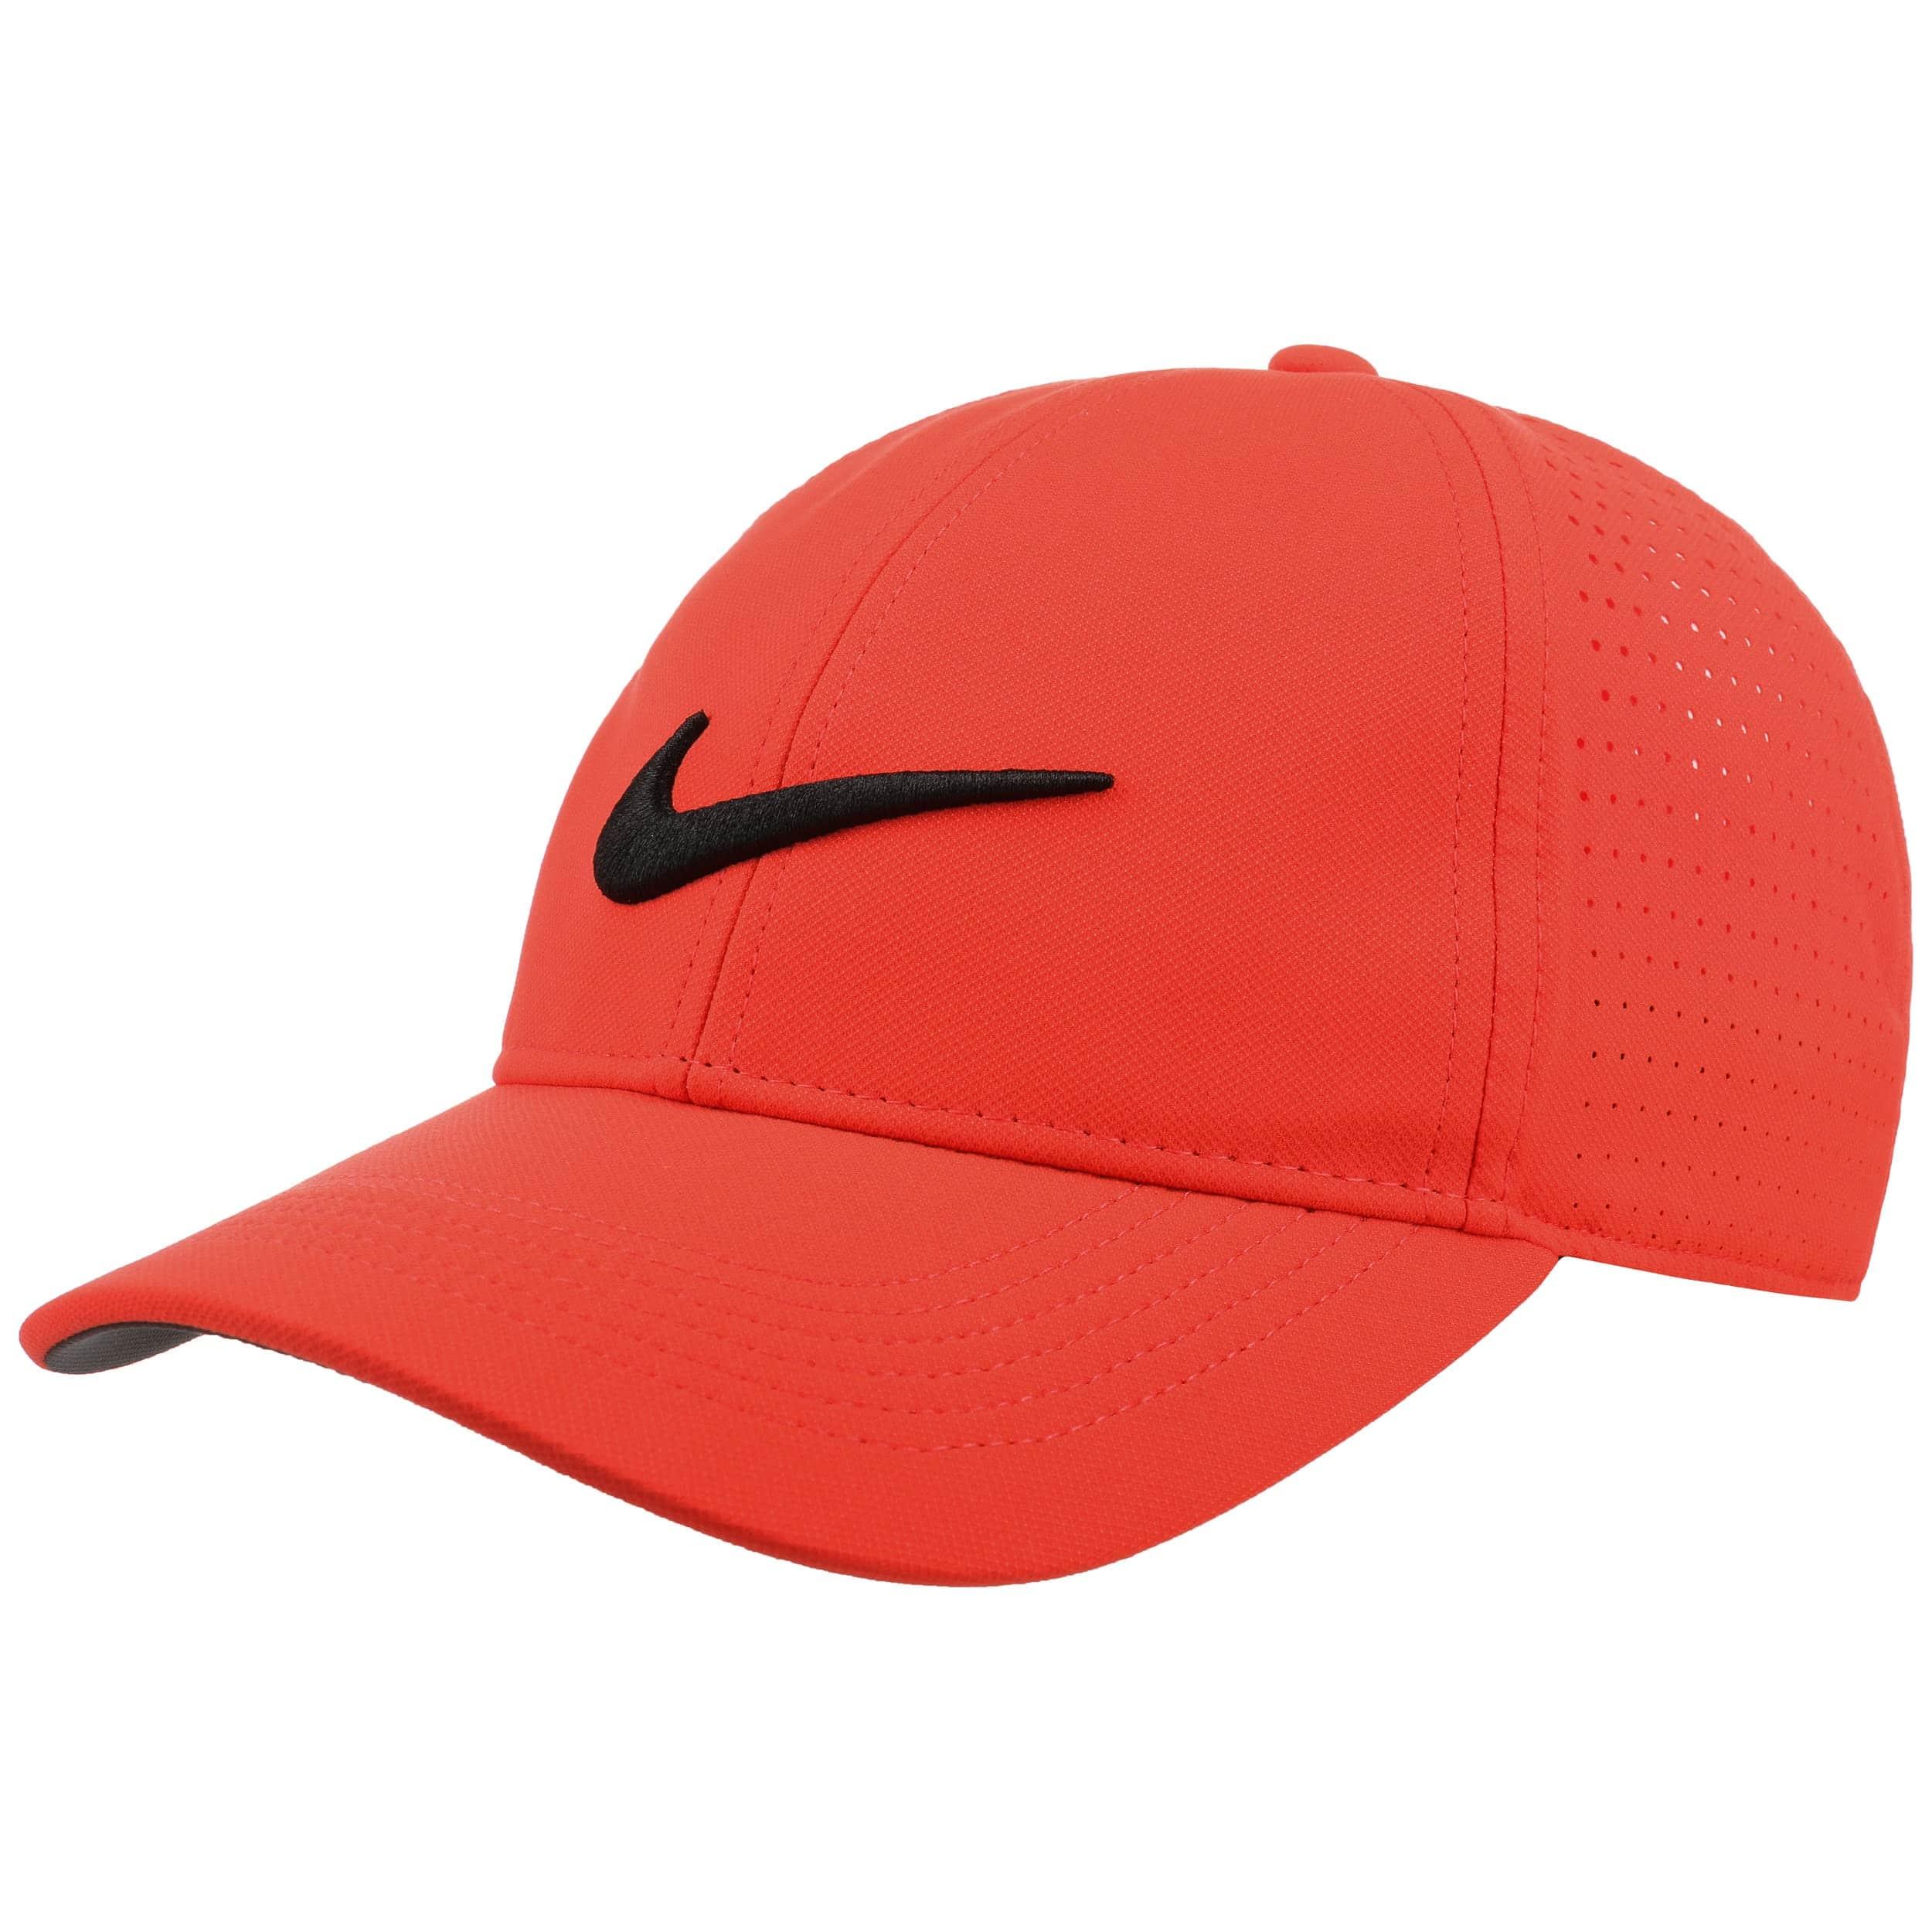 f5a28fbfe1d4a ... blanc 6 · Casquette Legacy 91 Perf by Nike - orange 6 ...